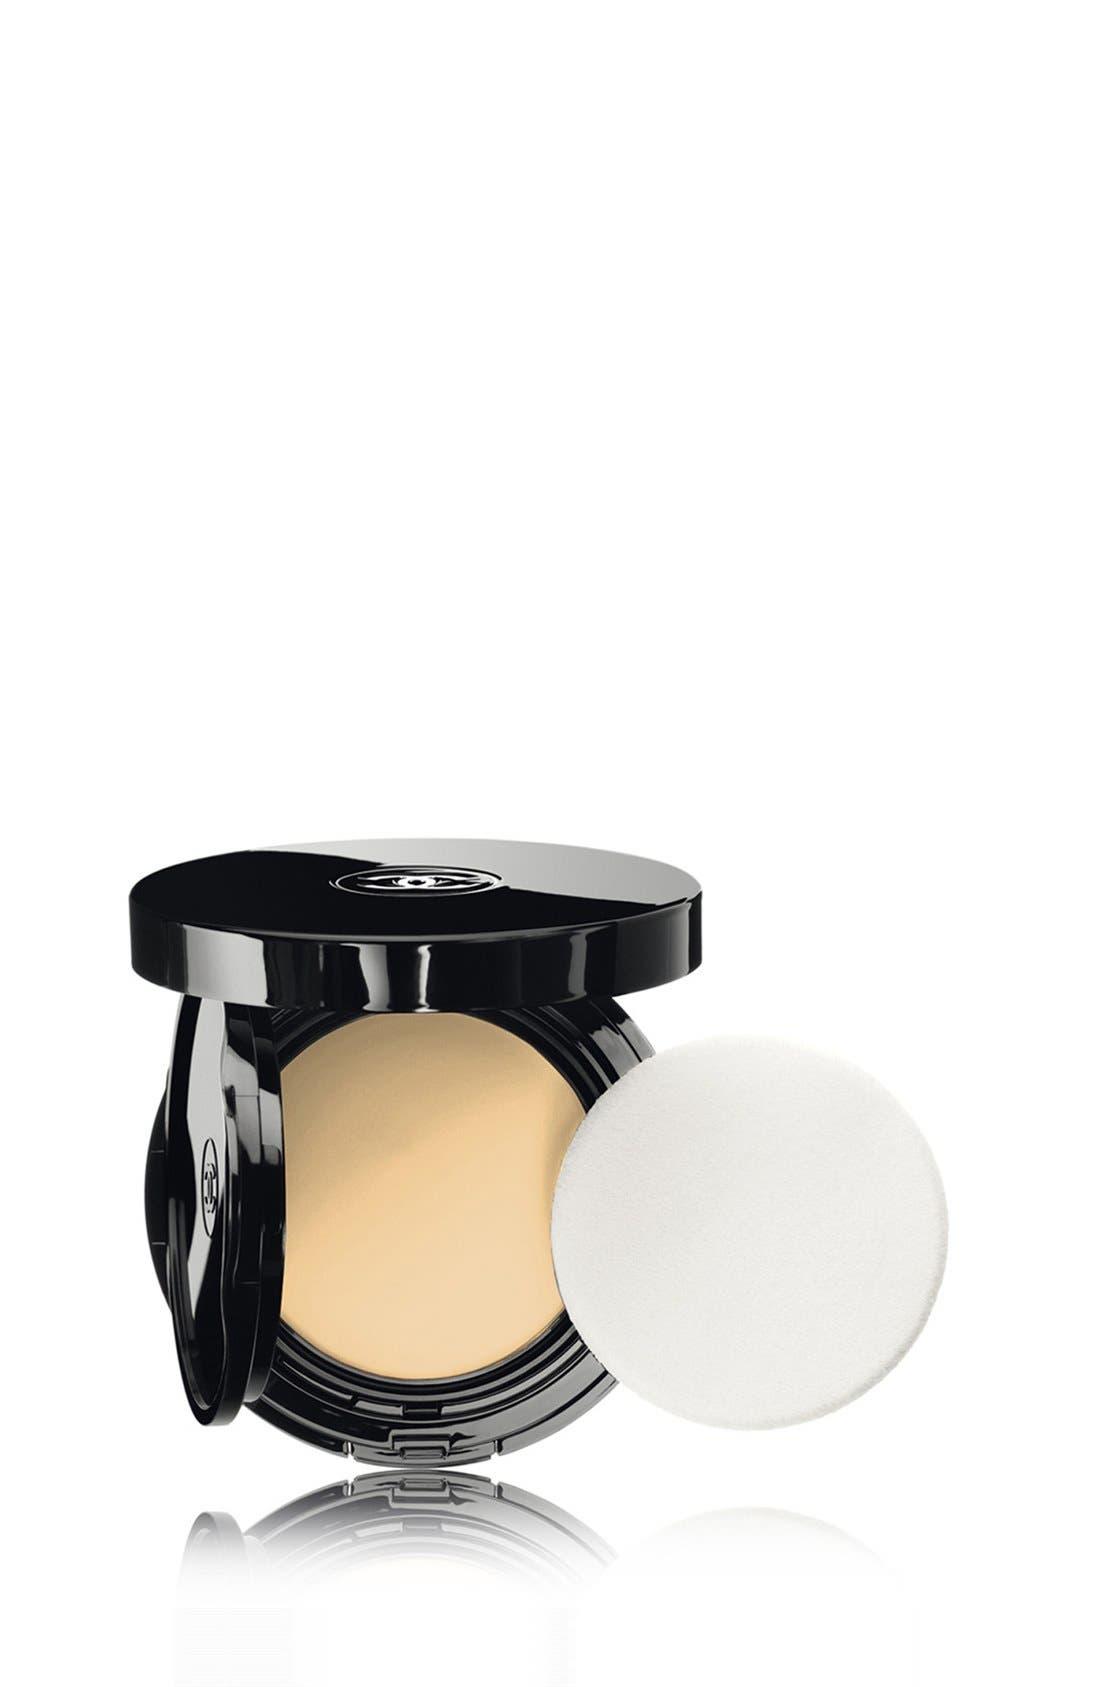 VITALUMIÈRE AQUA<br />Fresh and Hydrating Cream Compact Sunscreen Makeup Broad Spectrum SPF 15,                         Main,                         color, 030